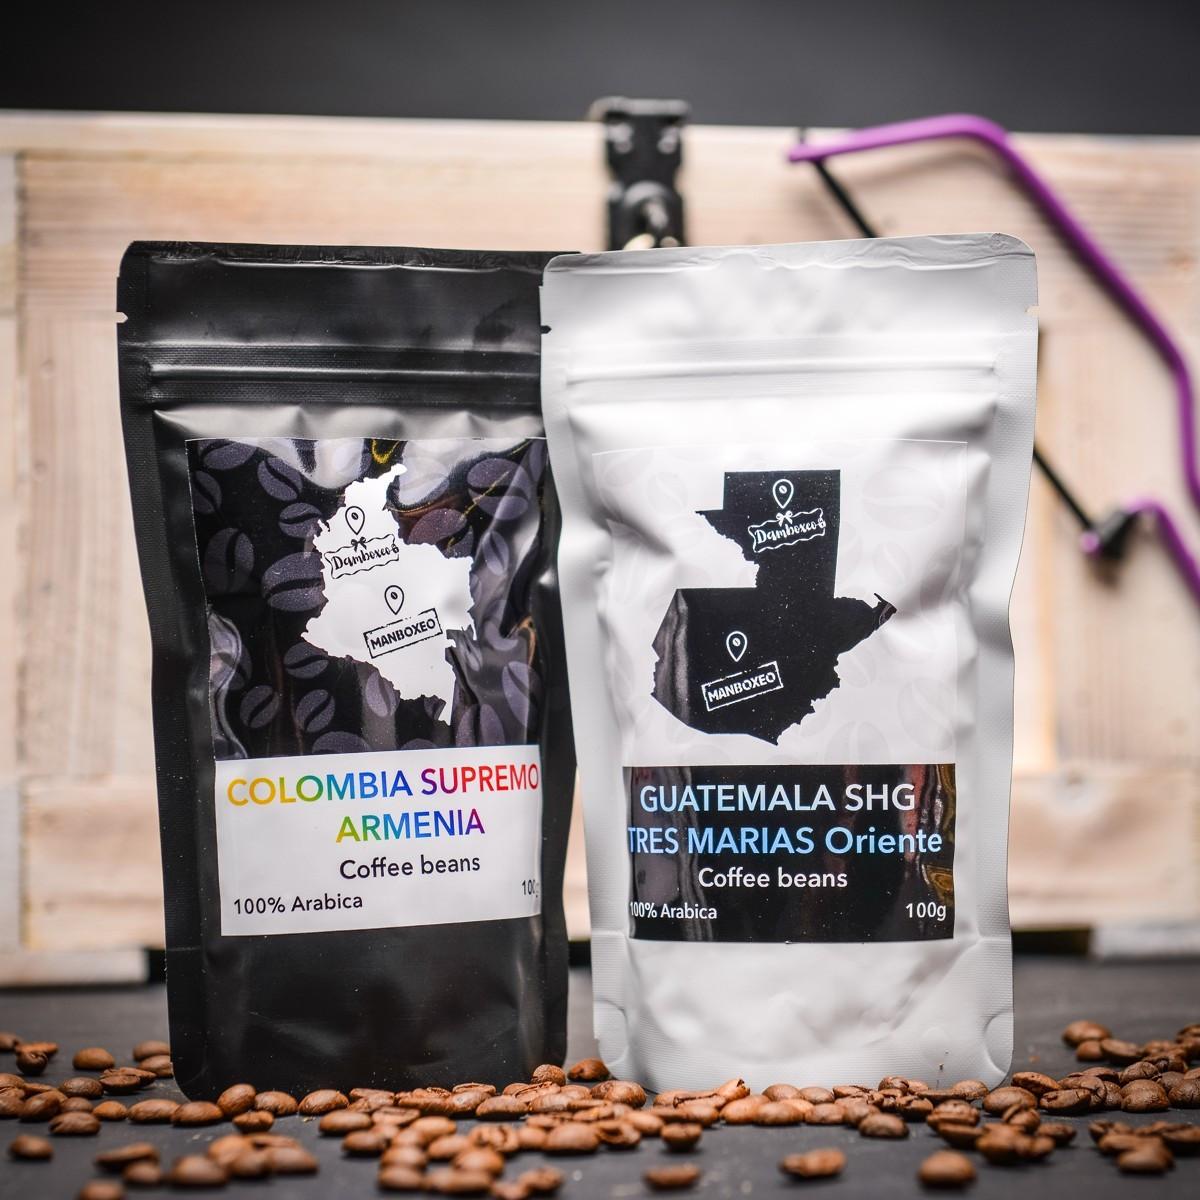 kavova zrna collumbia supremo armenia Guatemala SHG Tres Marias Oriente 100% Arabica 100 g.JPG